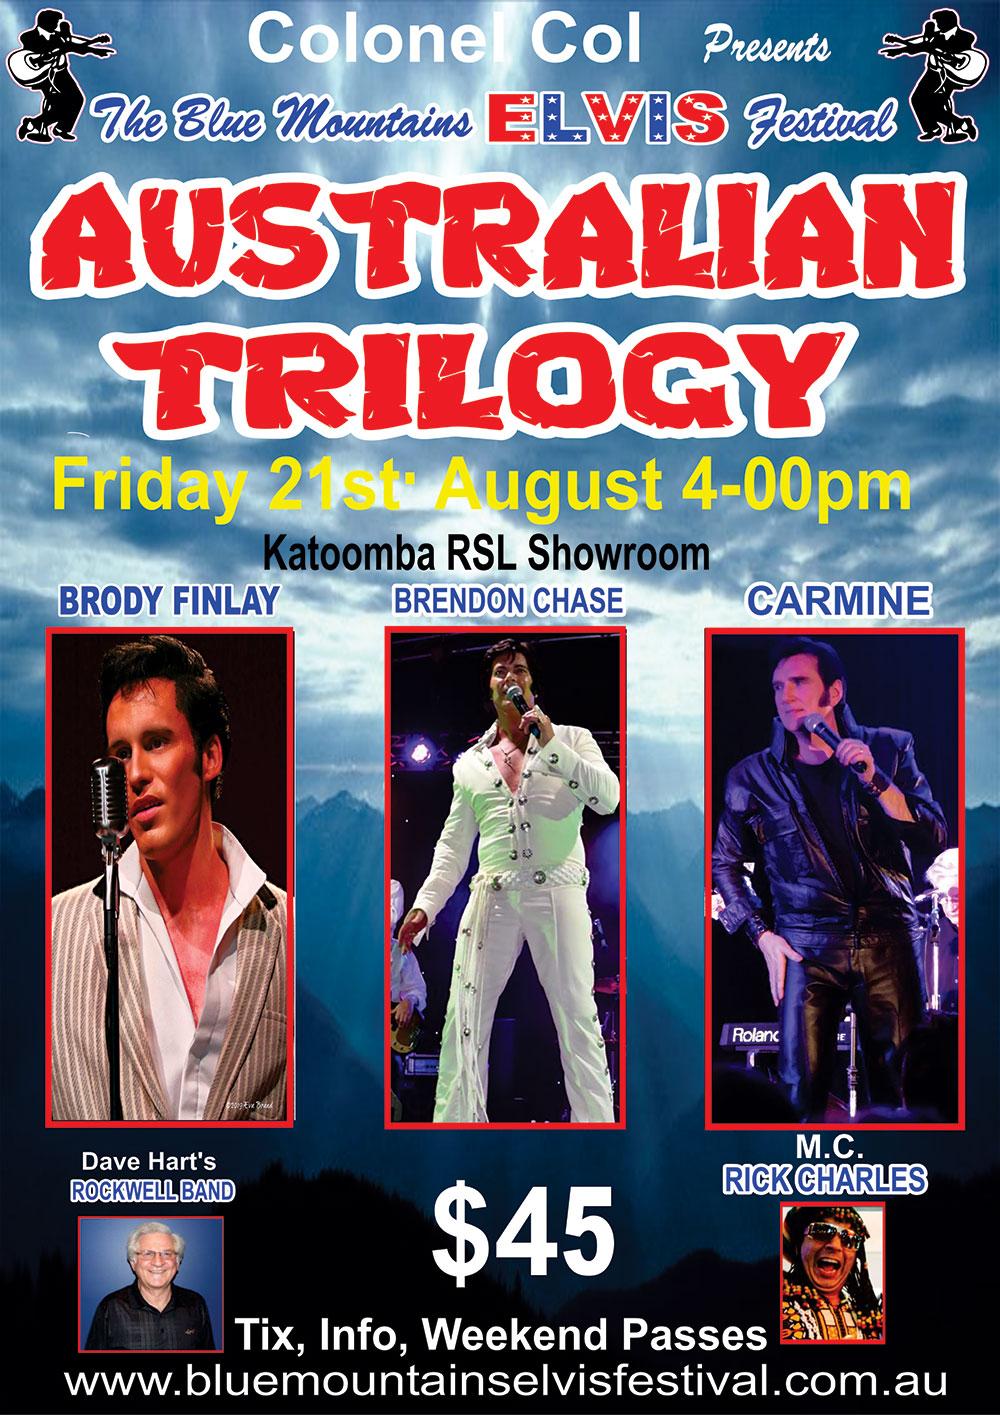 Australian-trilogy